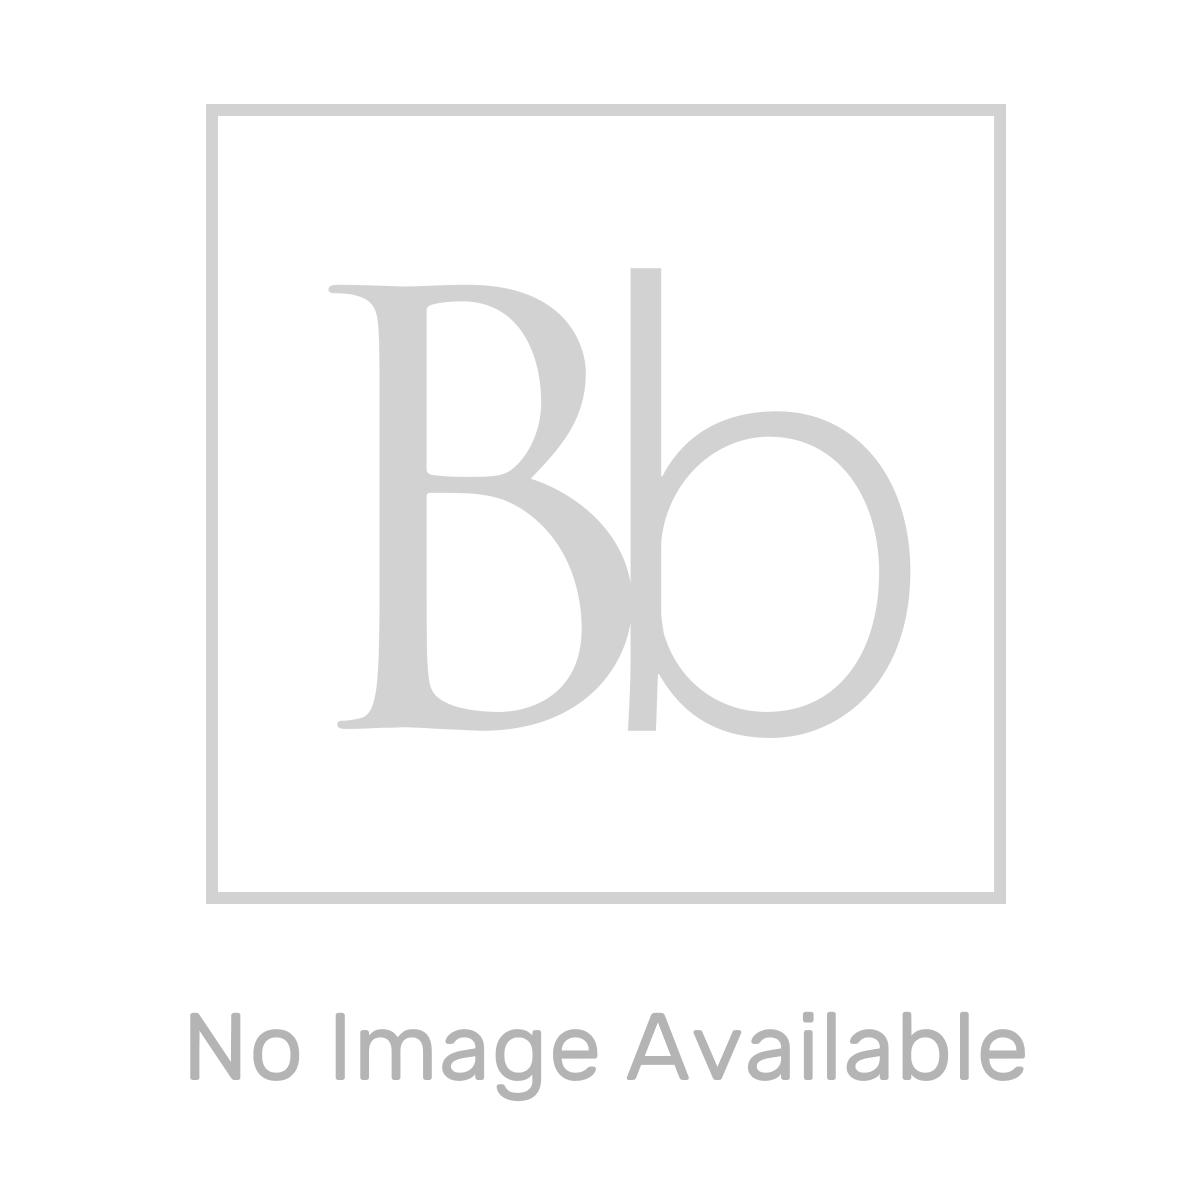 Merlyn Series 10 Showerwall Wetroom with Stabilising Bar